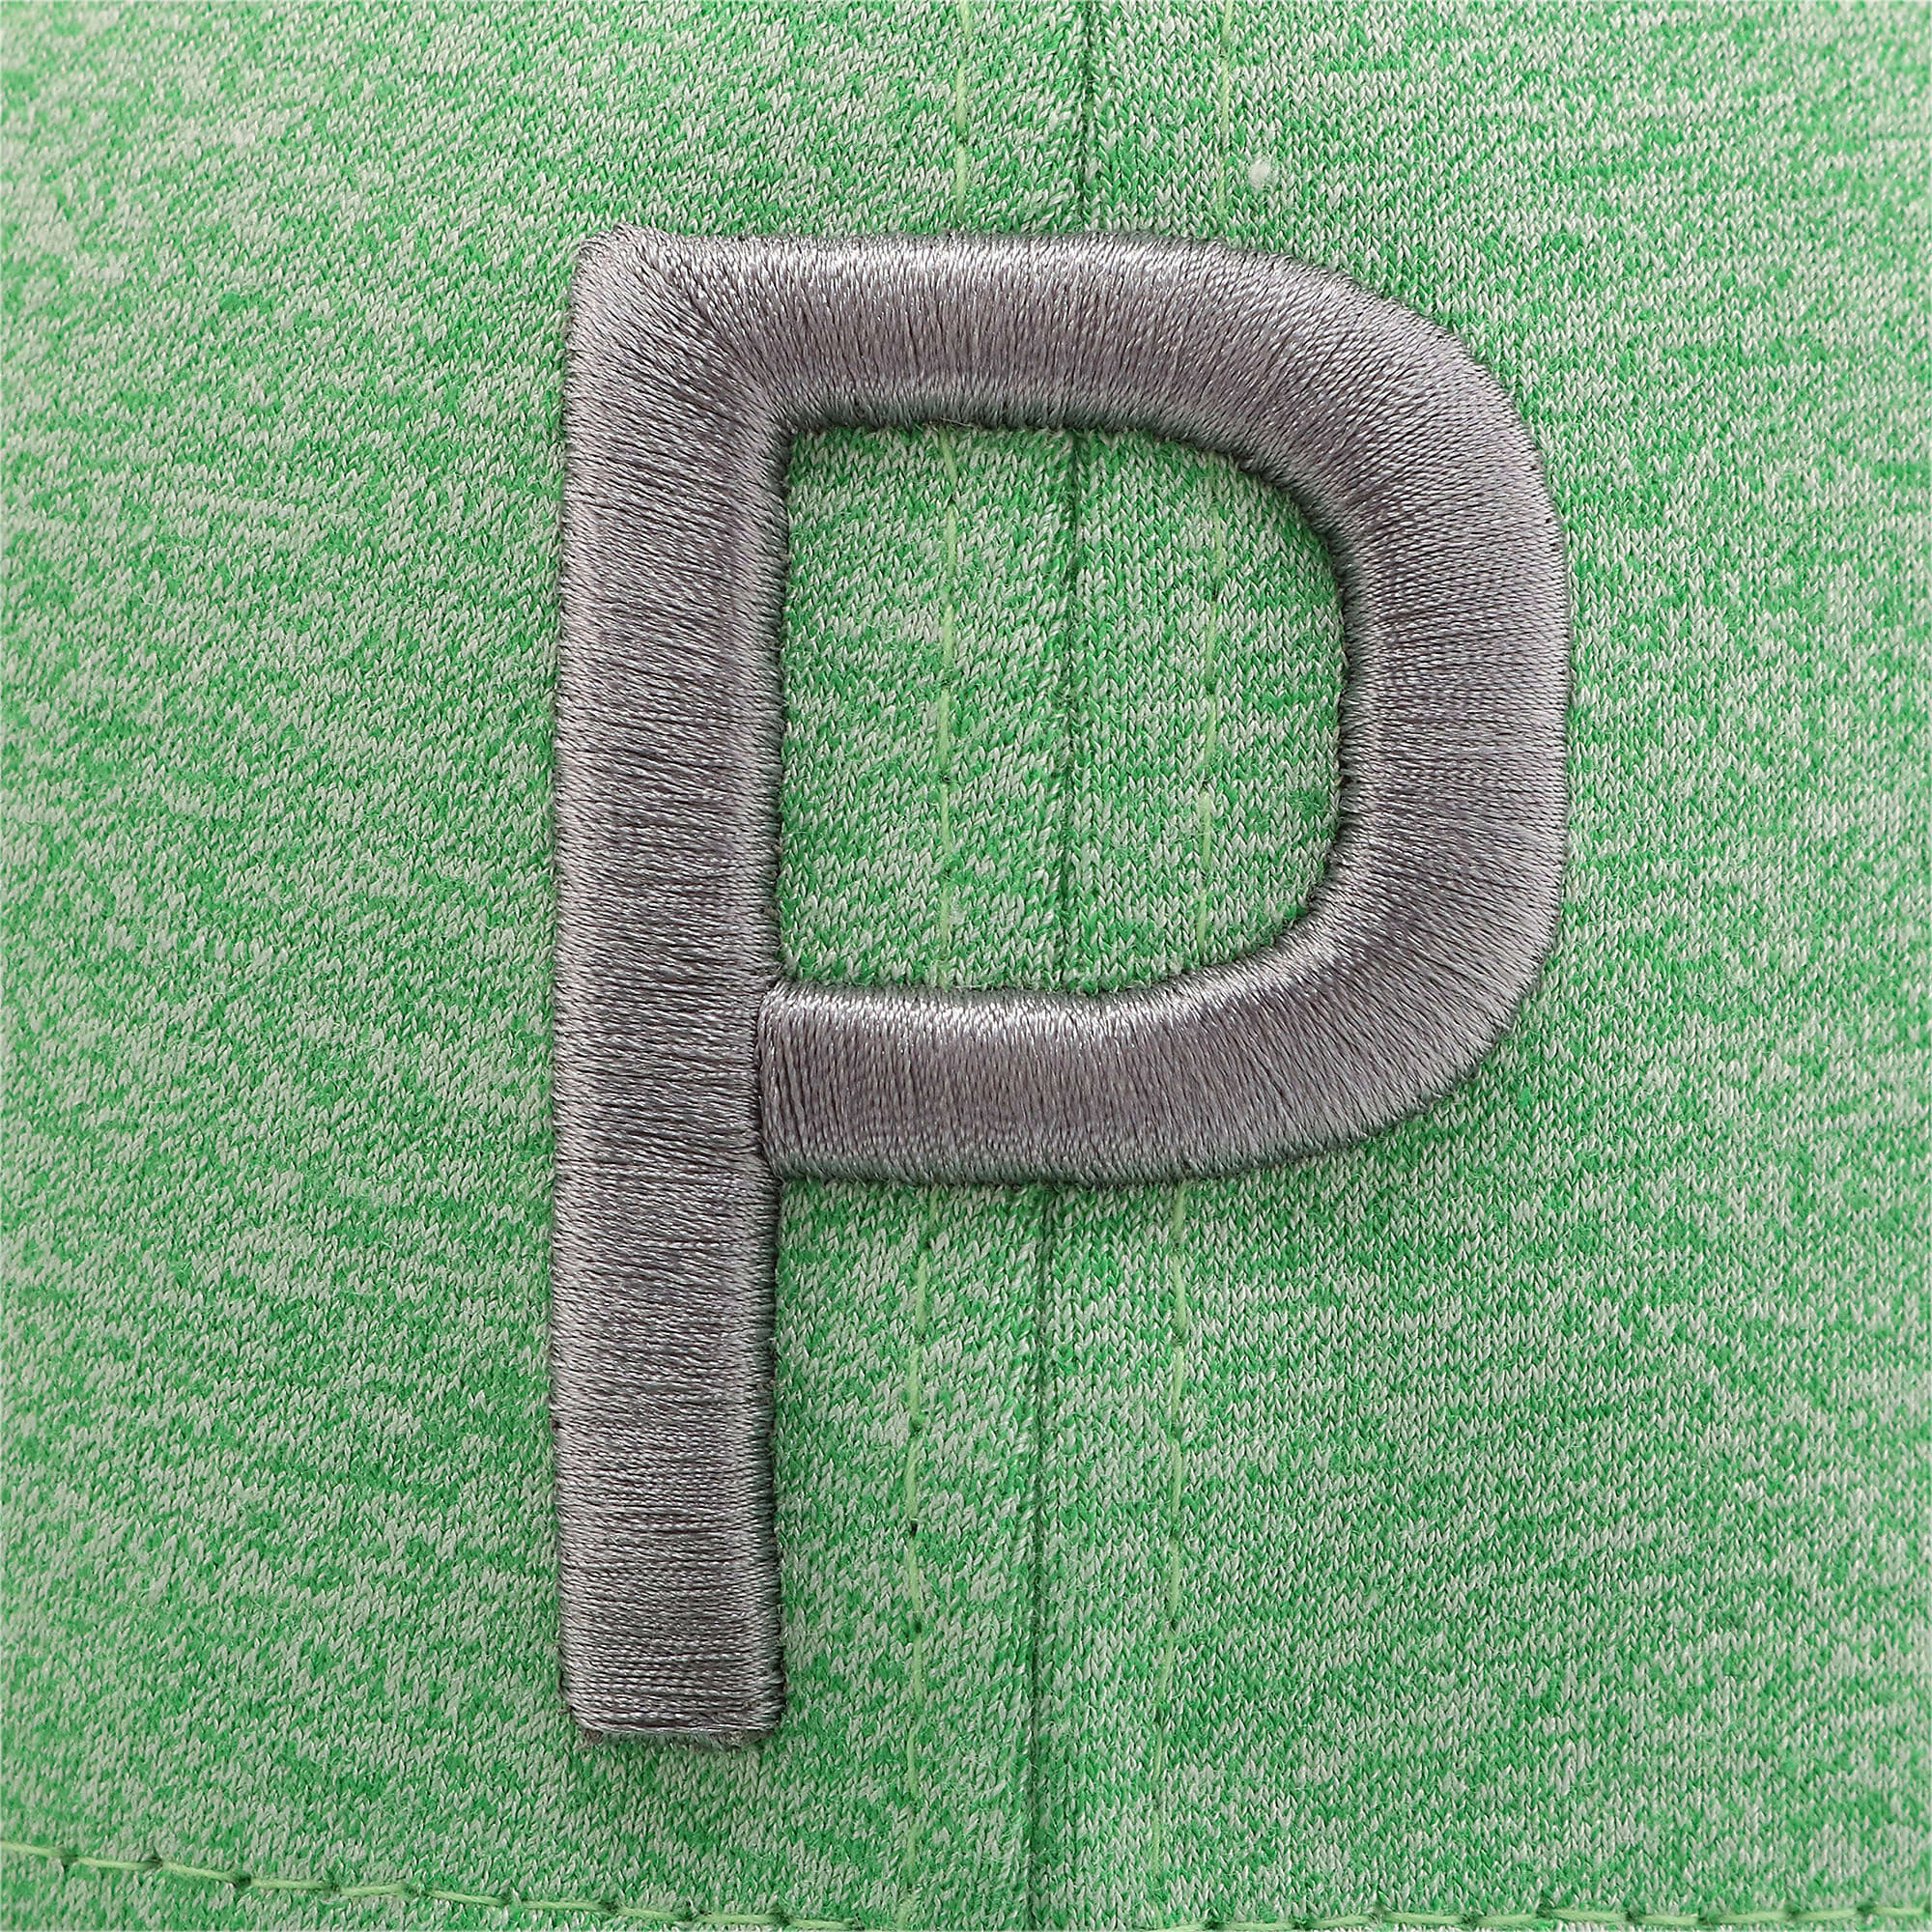 Thumbnail 5 of ゴルフ Pマークスナップバックキャップ, Irish Green, medium-JPN